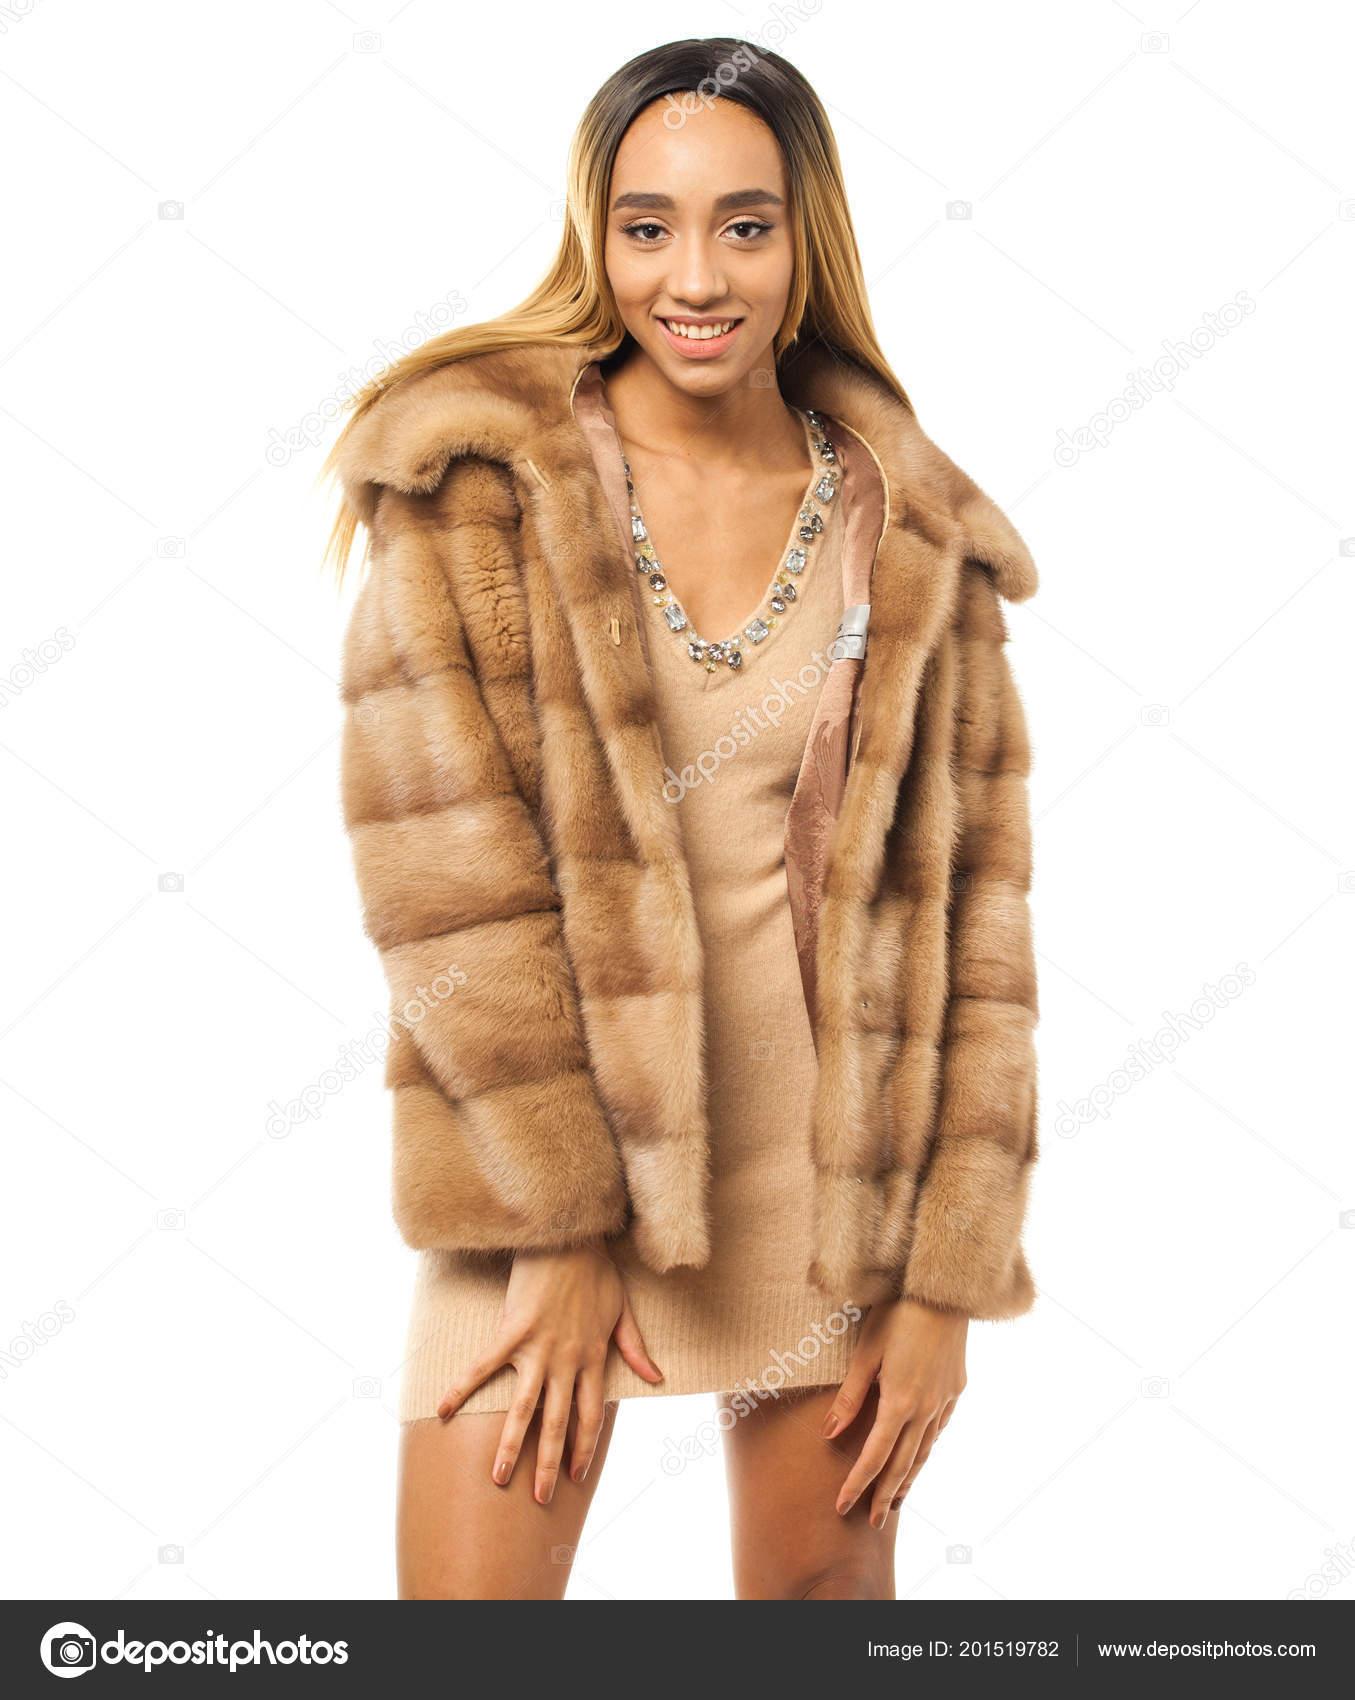 Abrigo Beige Sensual Africana Piel Cerca Joven Retrato Vestido Mujer RXwq1T